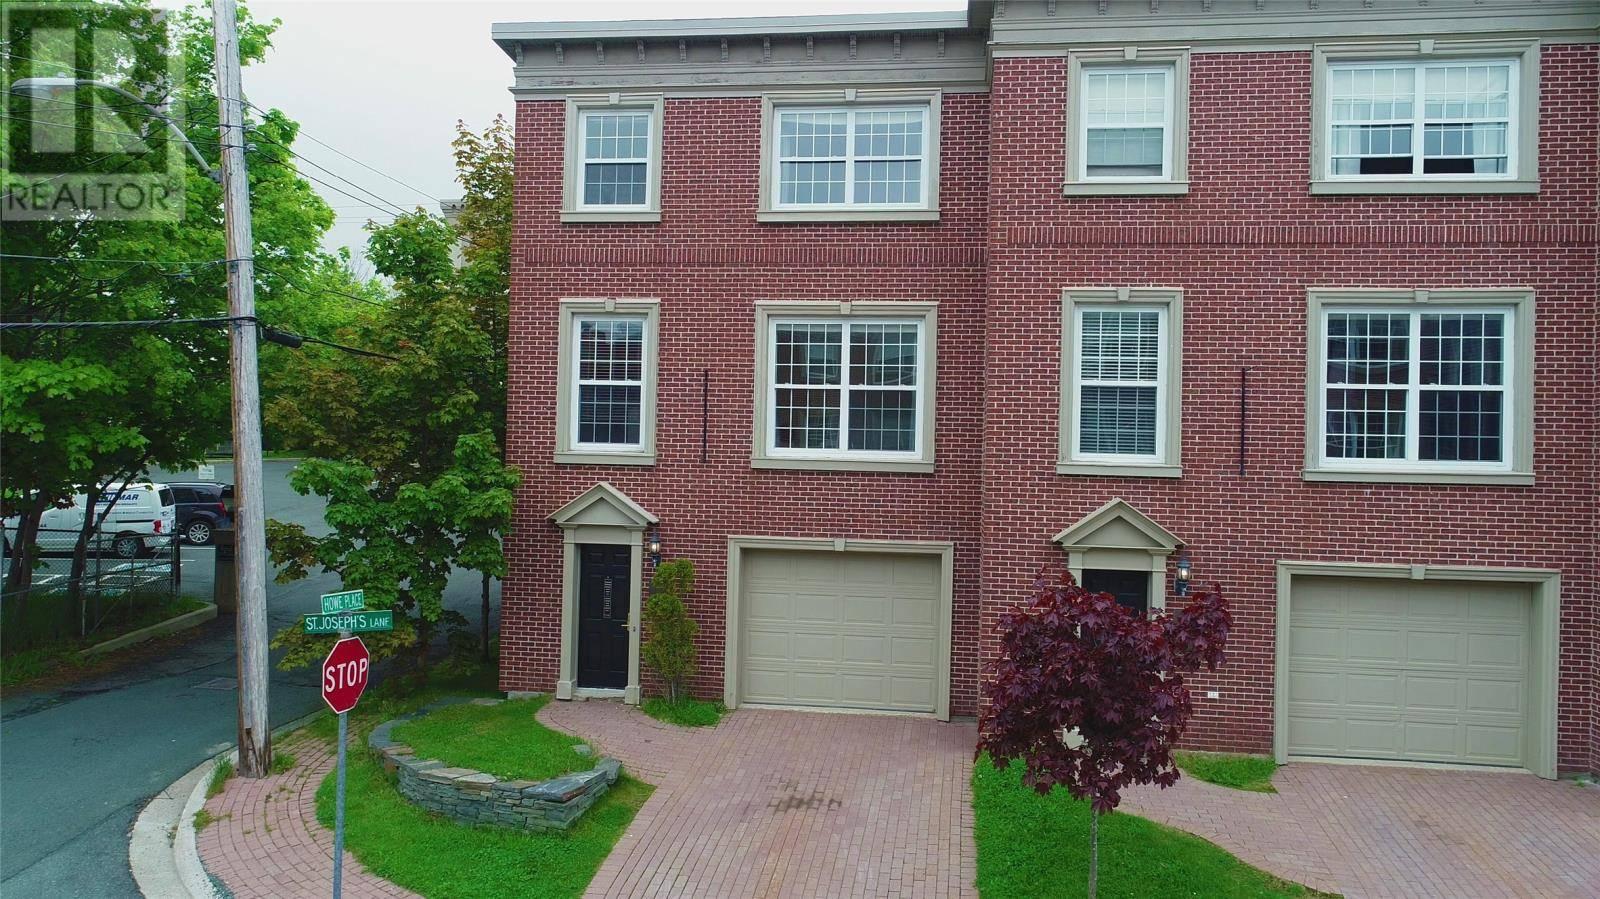 Home for sale at 20 St. Joseph's Ln St. John's Newfoundland - MLS: 1202812